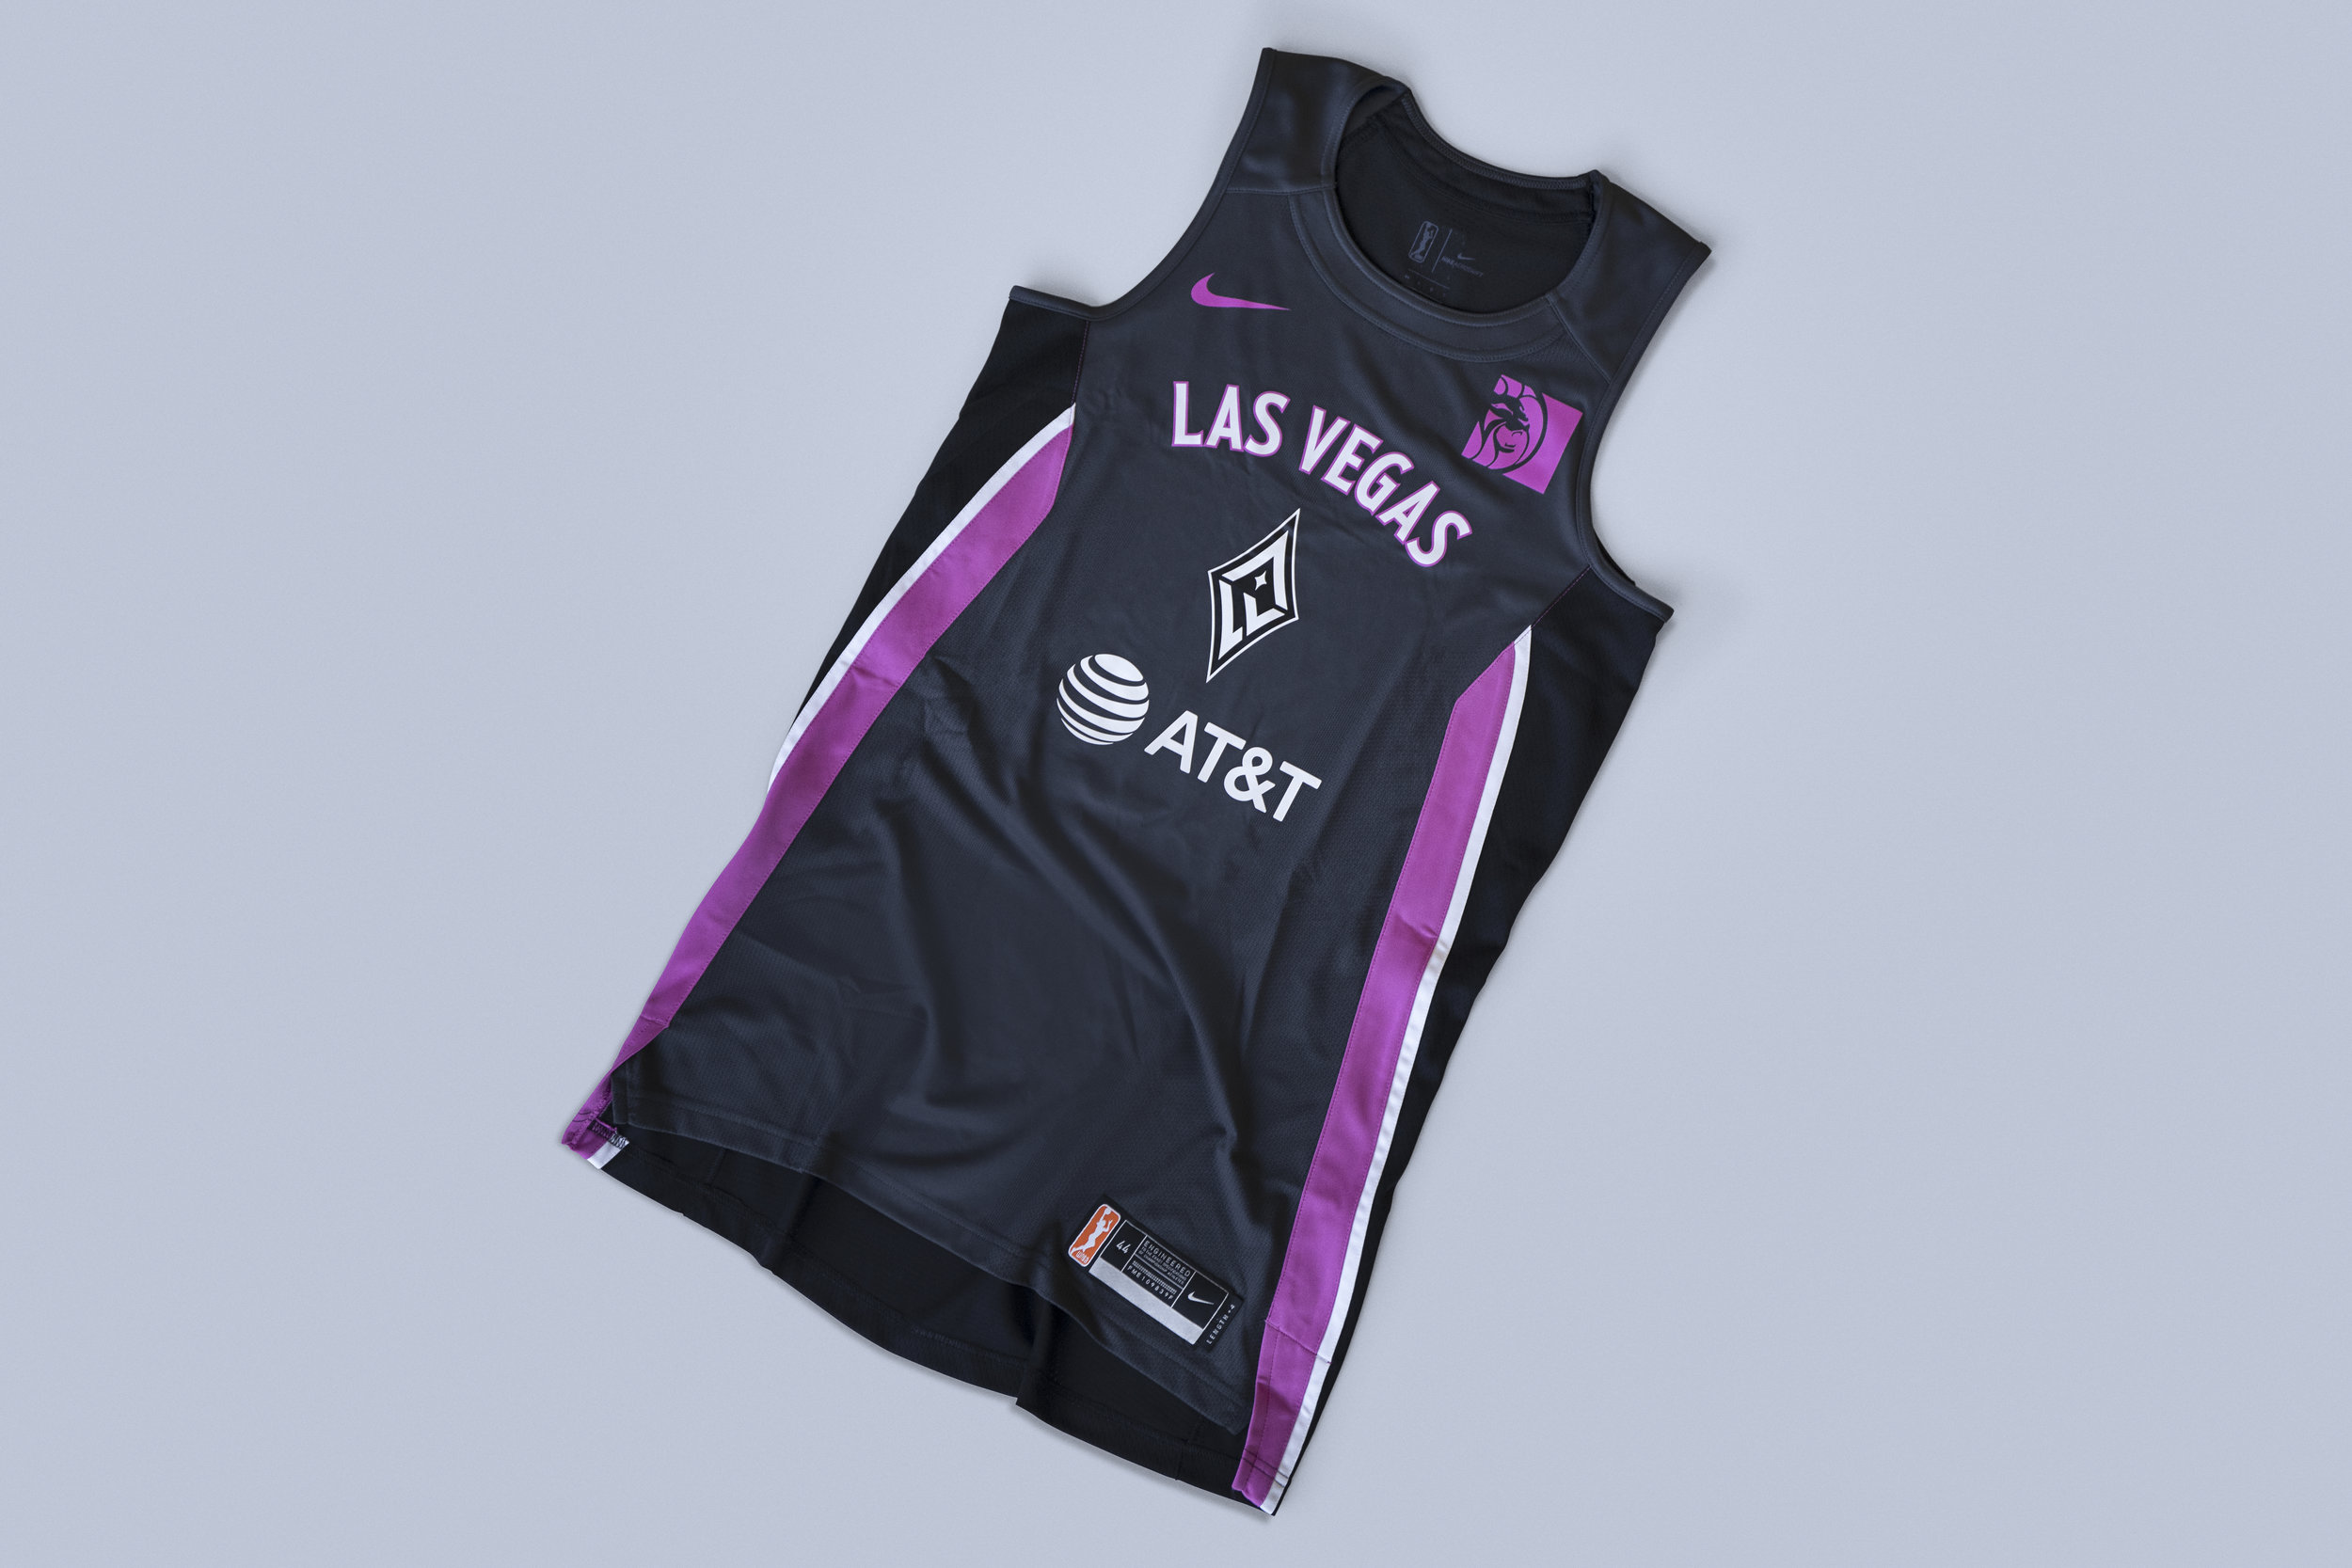 Nike_WNBA_Uniforms2019_BHA_LasVegasAces_IMG_9039_86898.jpg